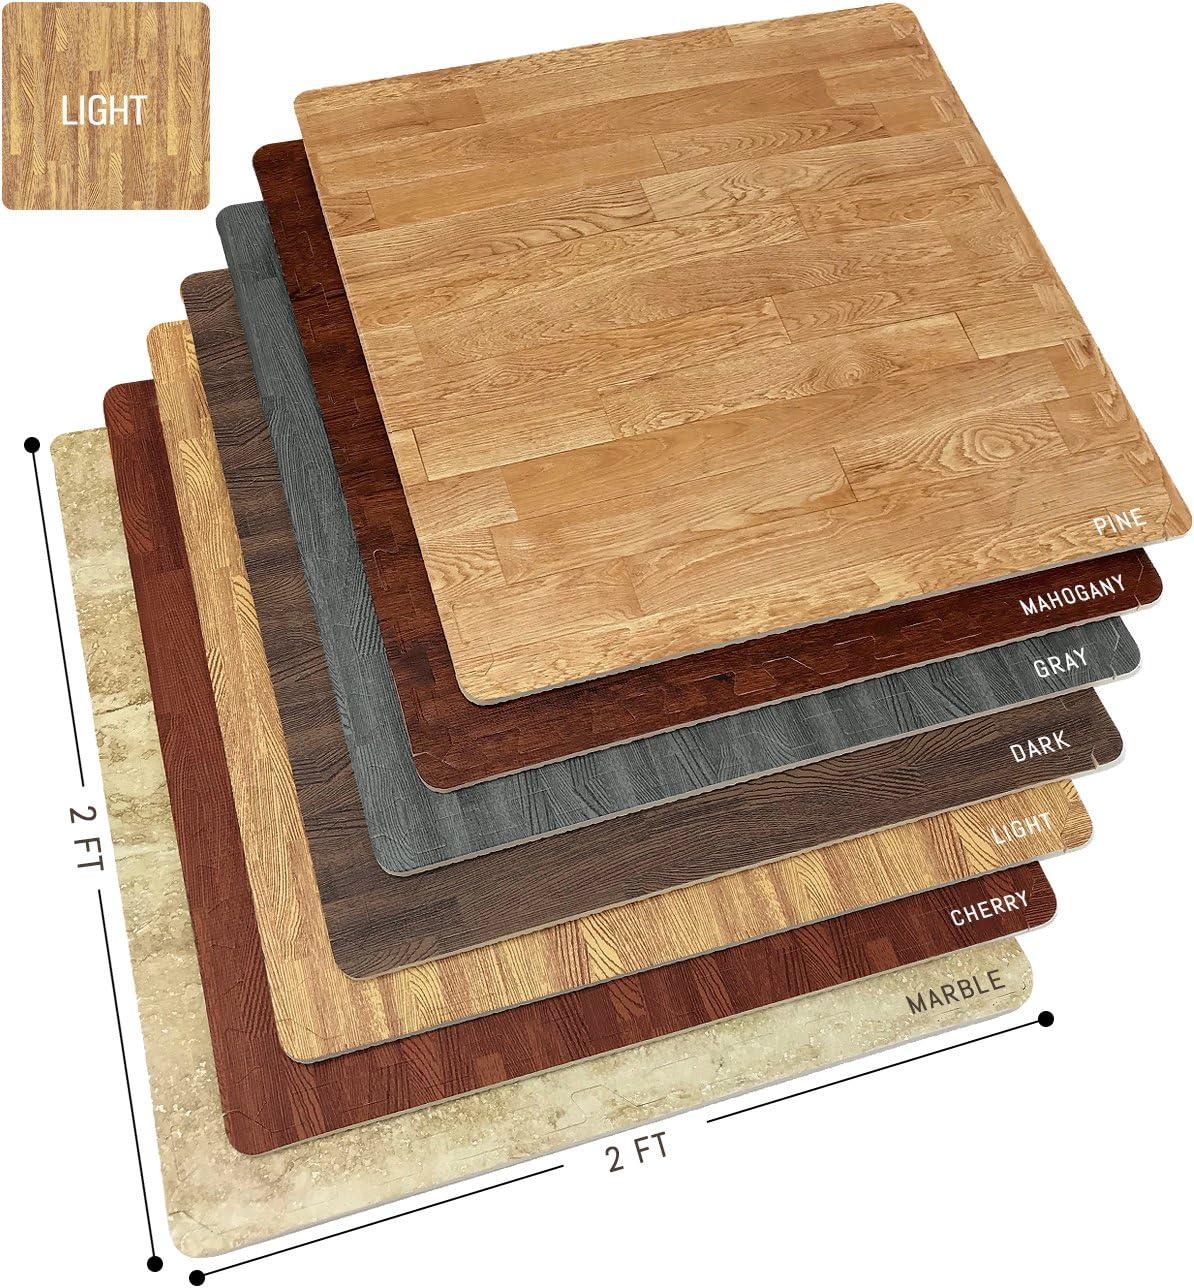 Sorbus Wood Grain Floor Mats Foam Interlocking Mats Tile 3/8-Inch Thick Flooring Wood Mat Tiles Borders - Home Office Playroom Basement Trade Show